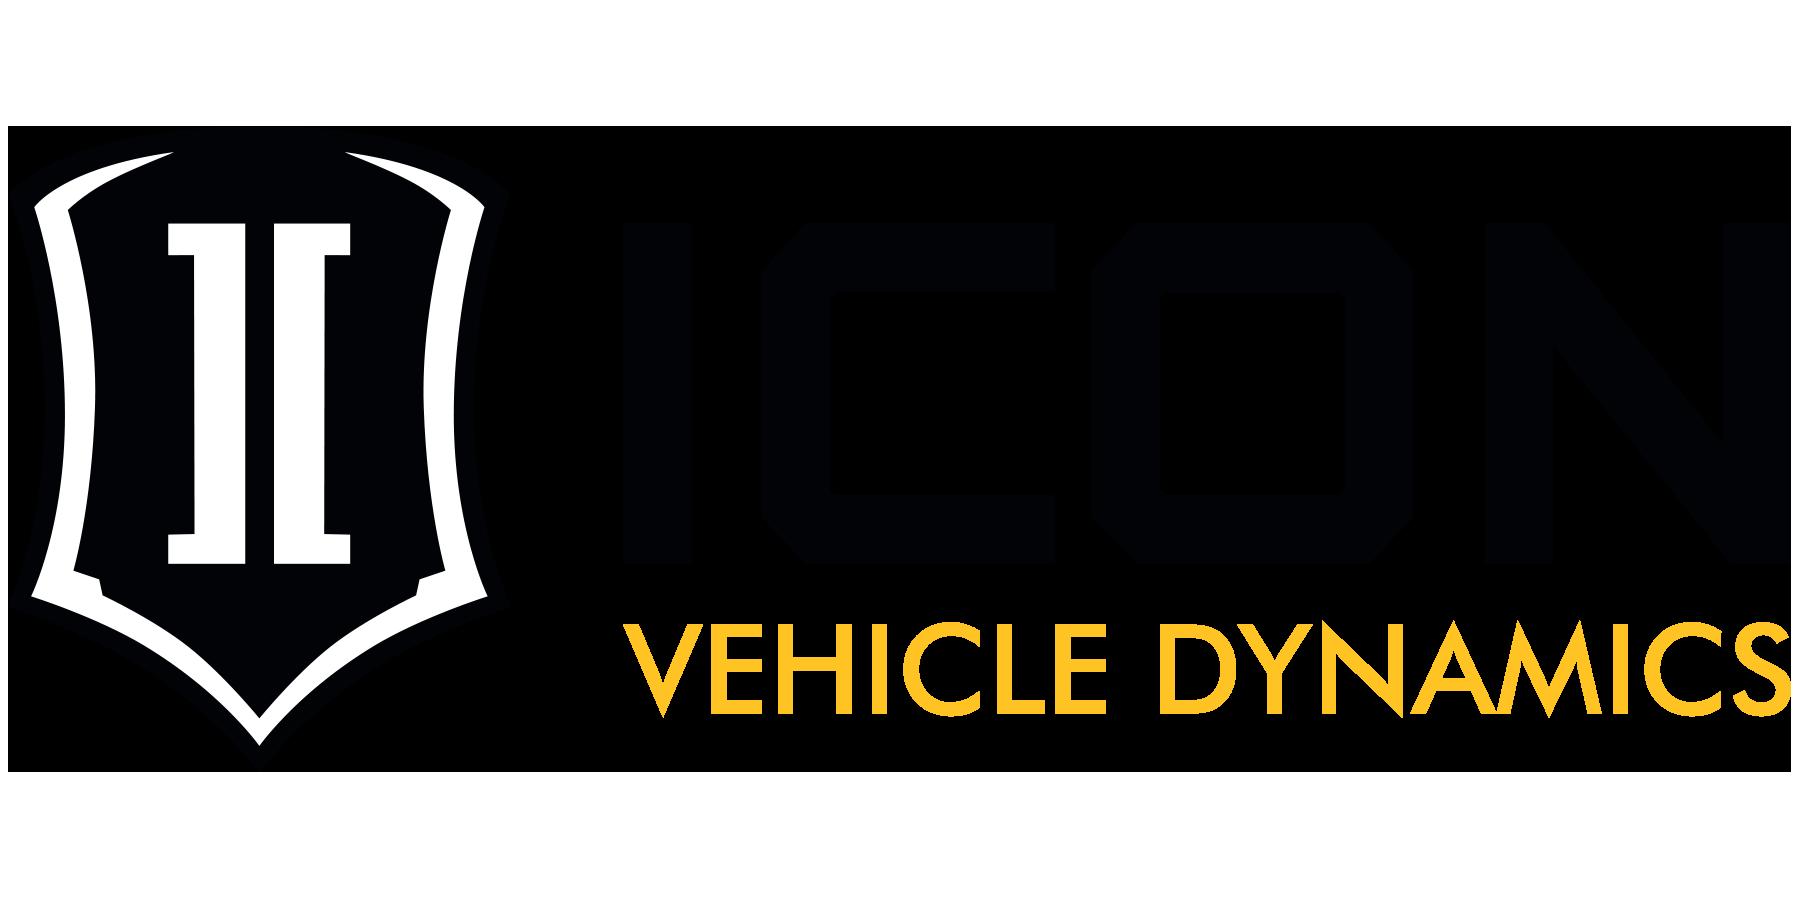 ICON - Vehicle Dynamics